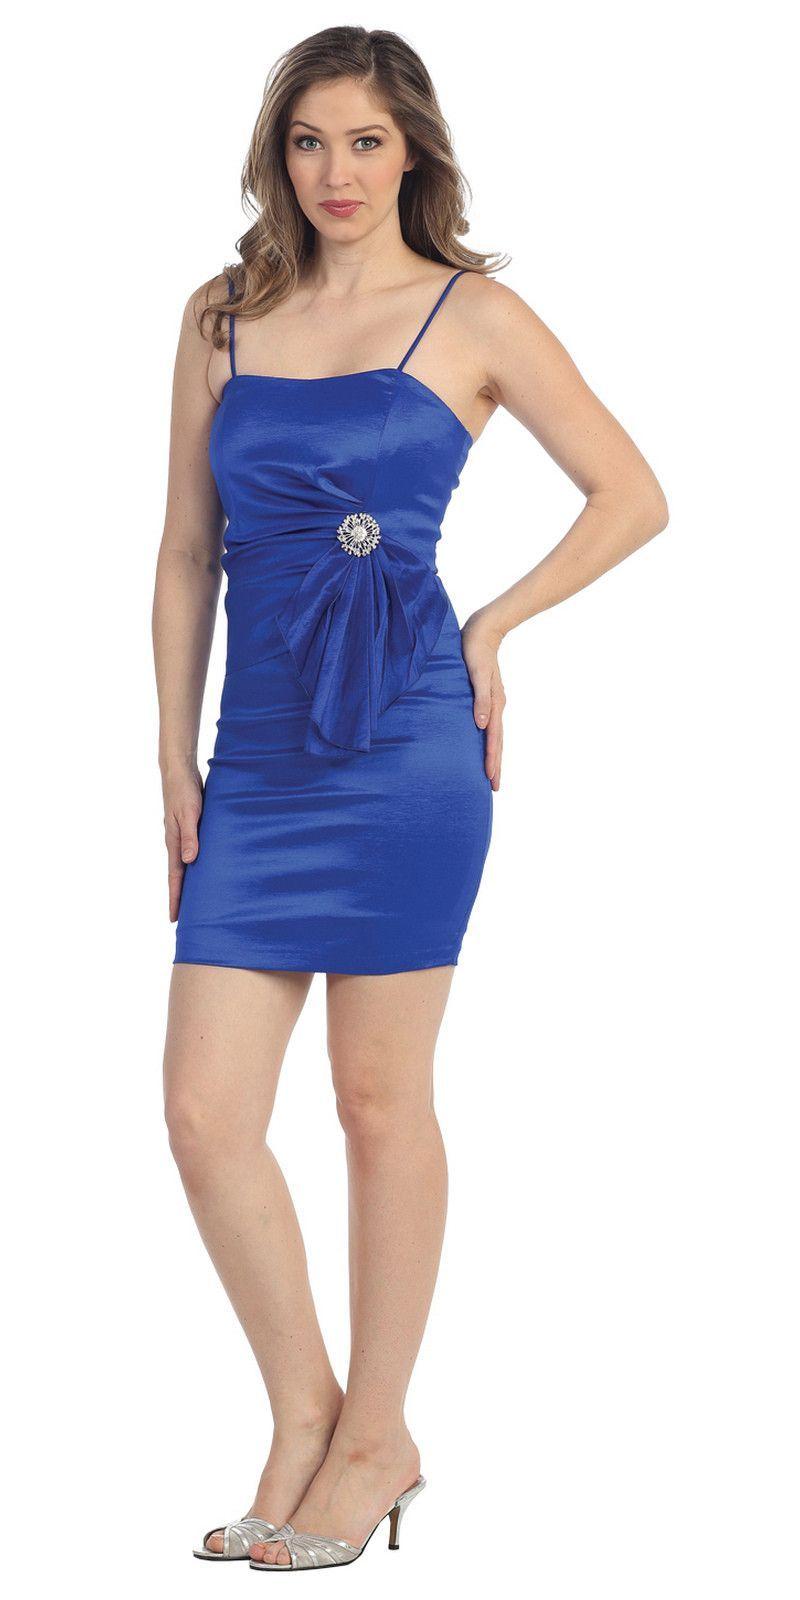 Modest Short Royal Blue Cocktail-Dress Spaghetti Straps Tight Fit ...